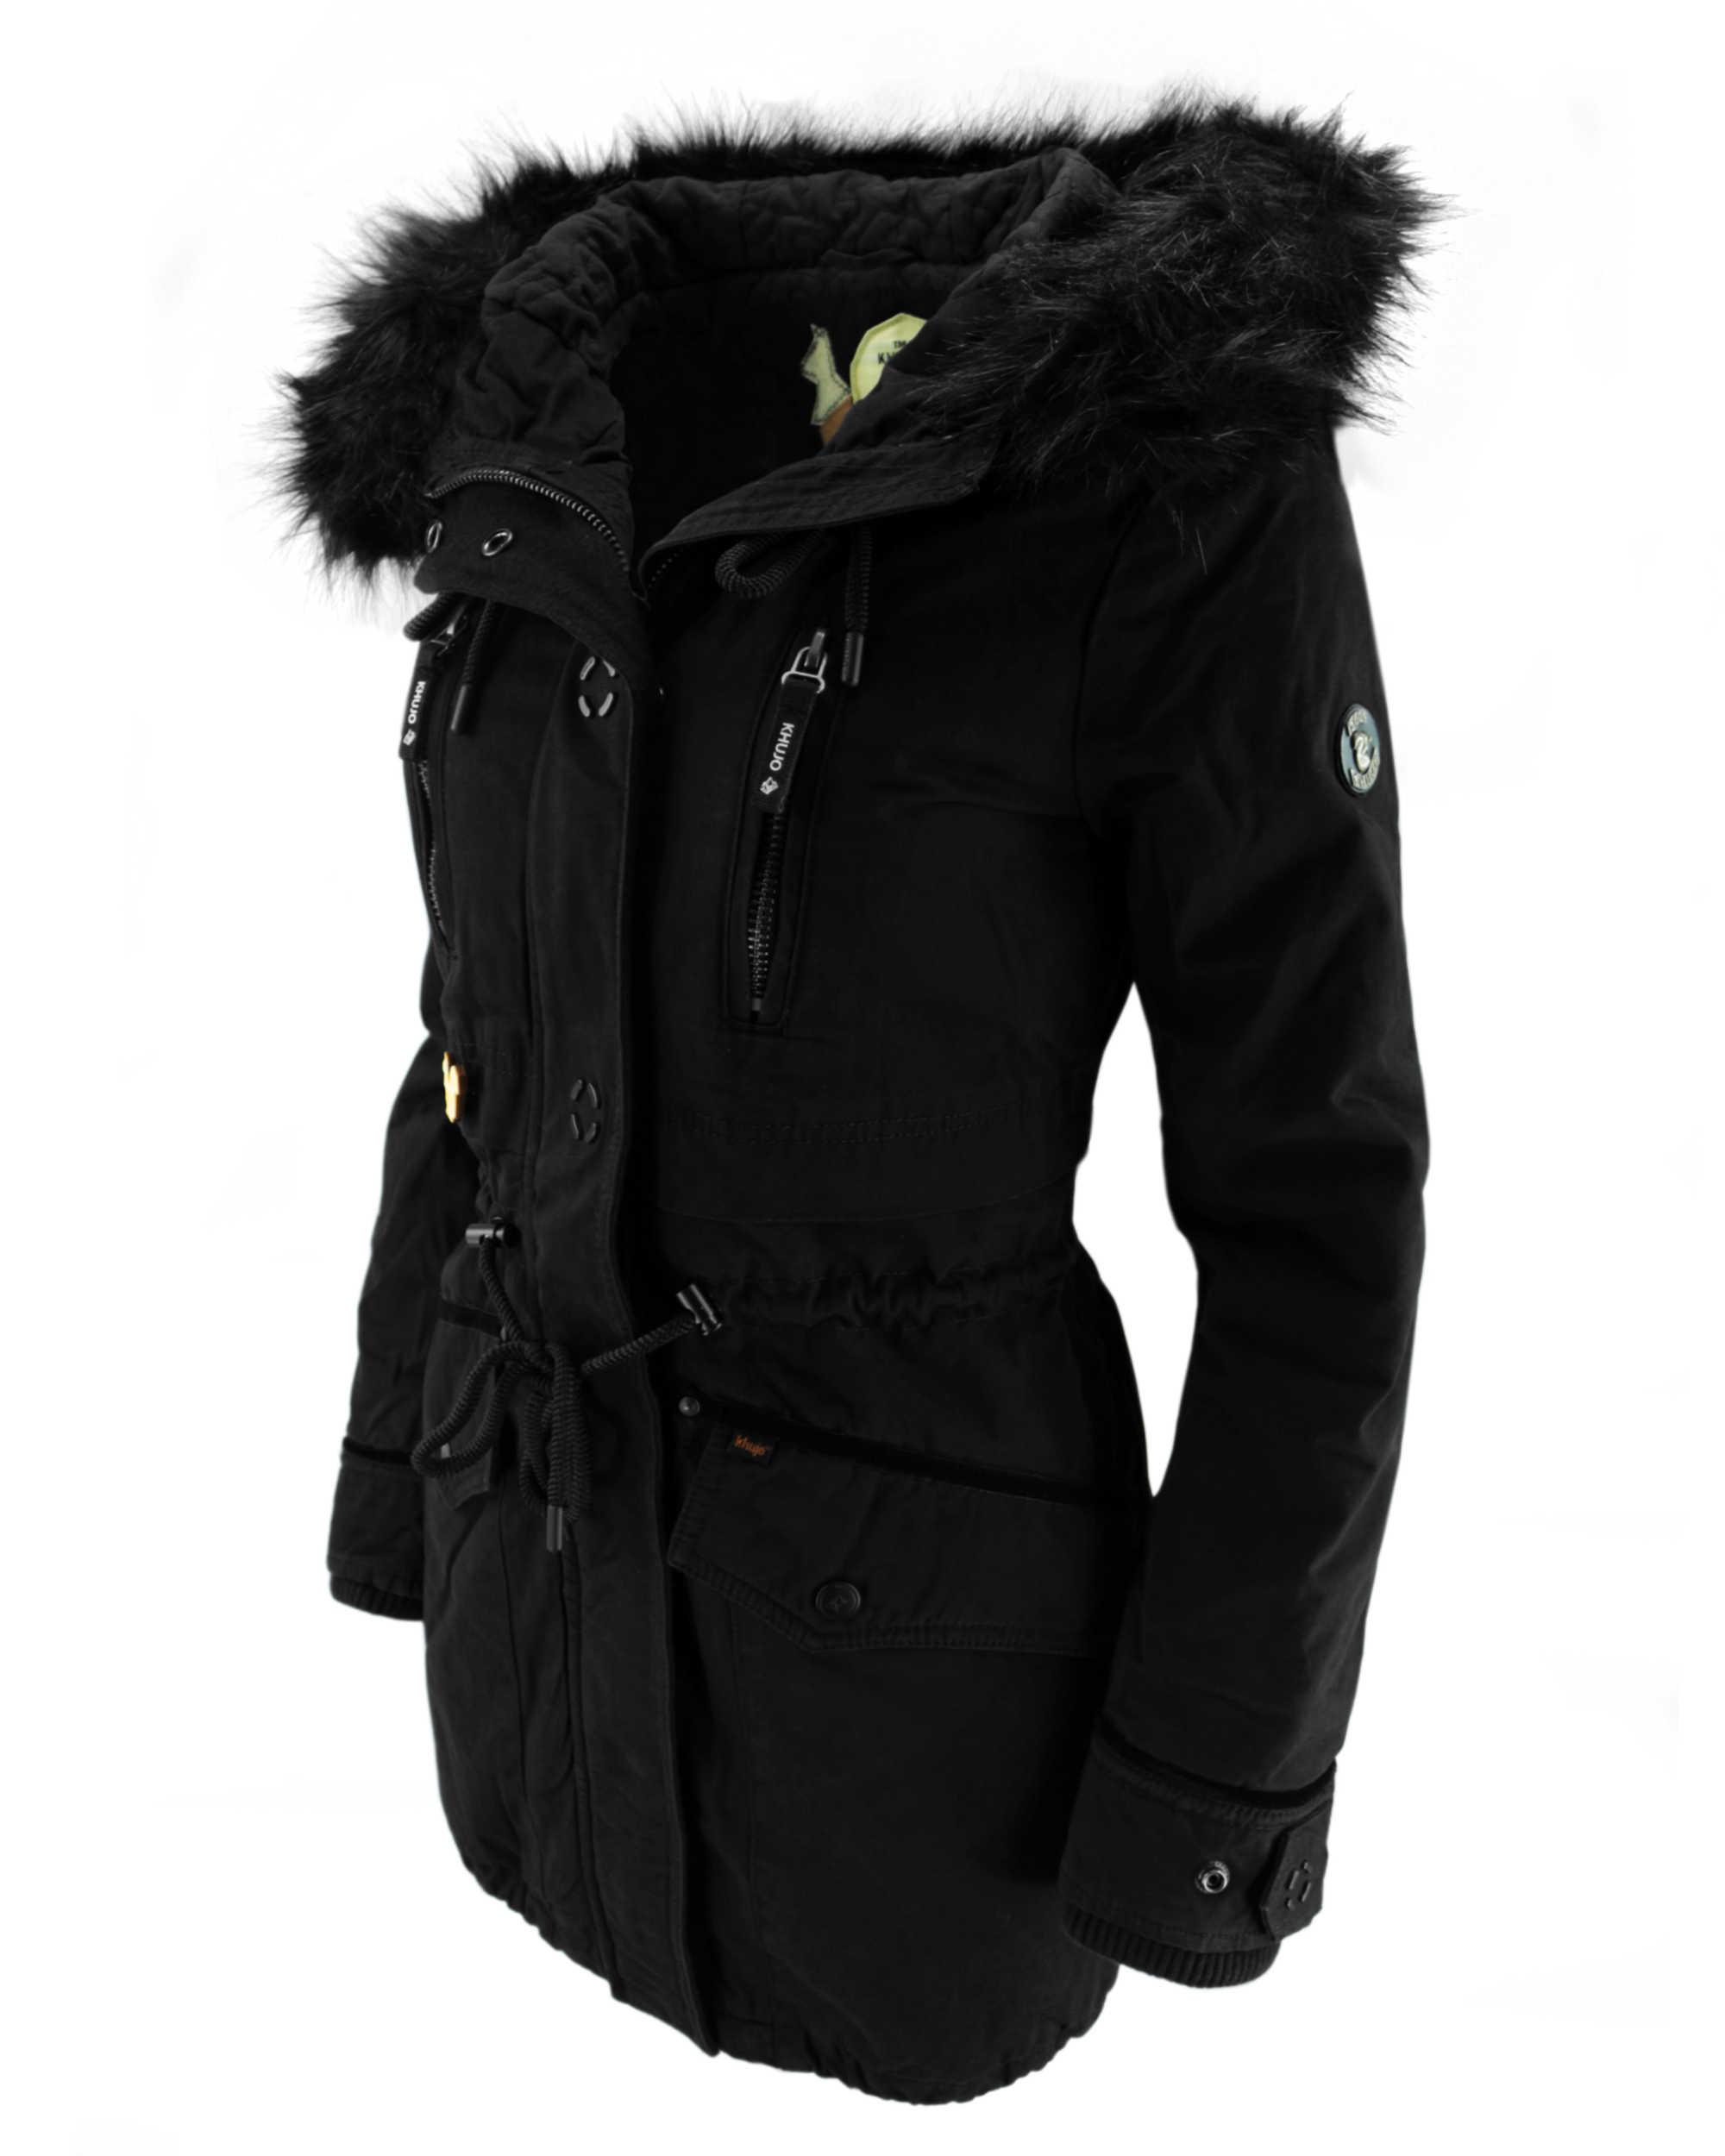 Details für abholen niedrigster Rabatt KHUJO Damen Wintermantel Mantel Jacke FREJA Winter Parka schwarz Kapuze Fell